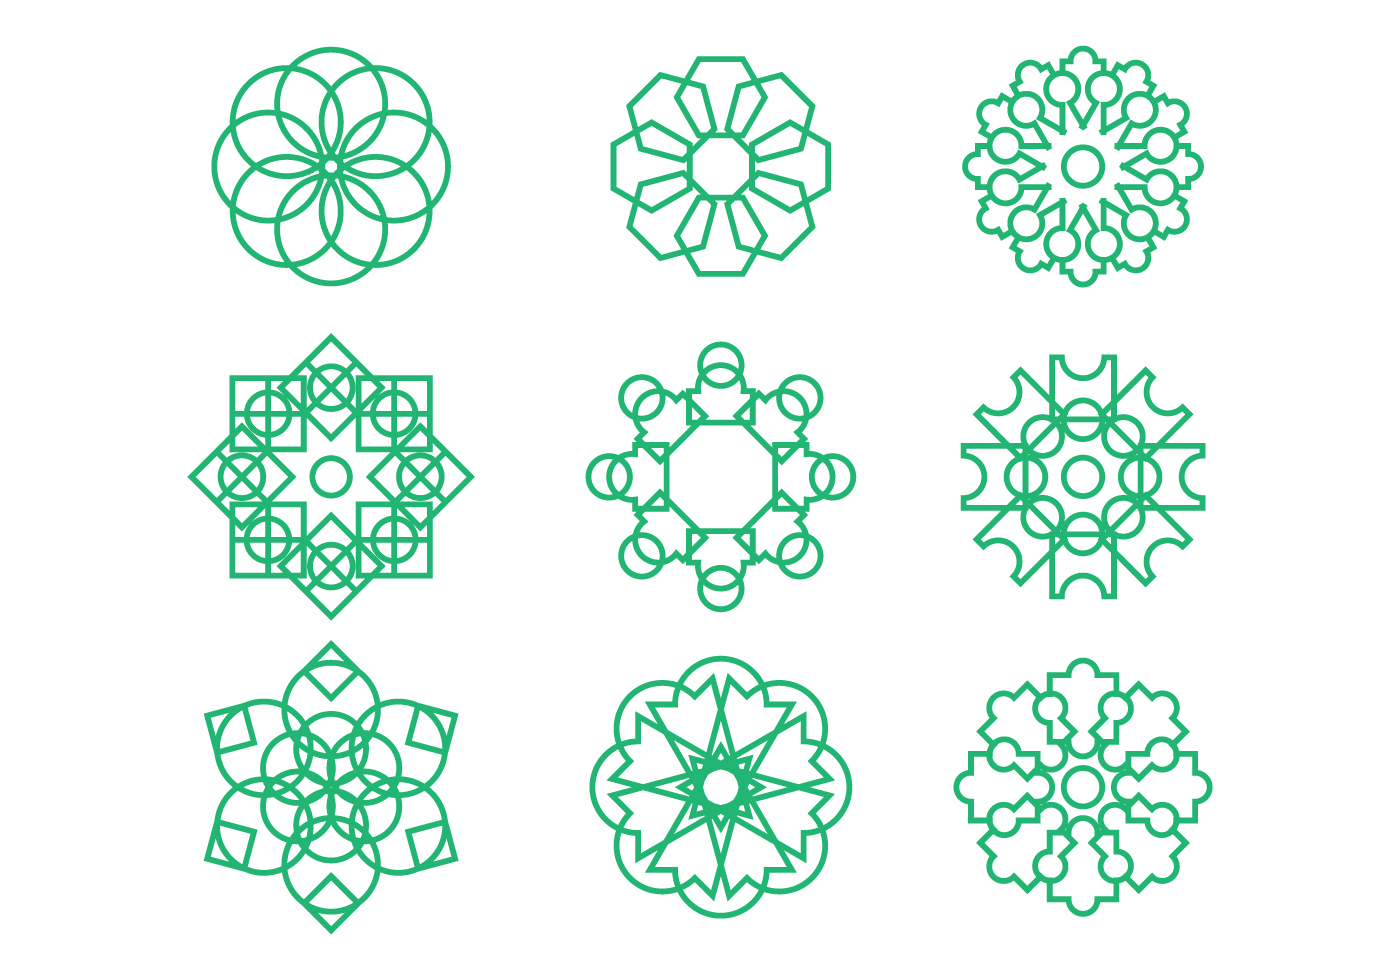 Line Art Design Free Download : Free arabesque graphic ornament vectors download